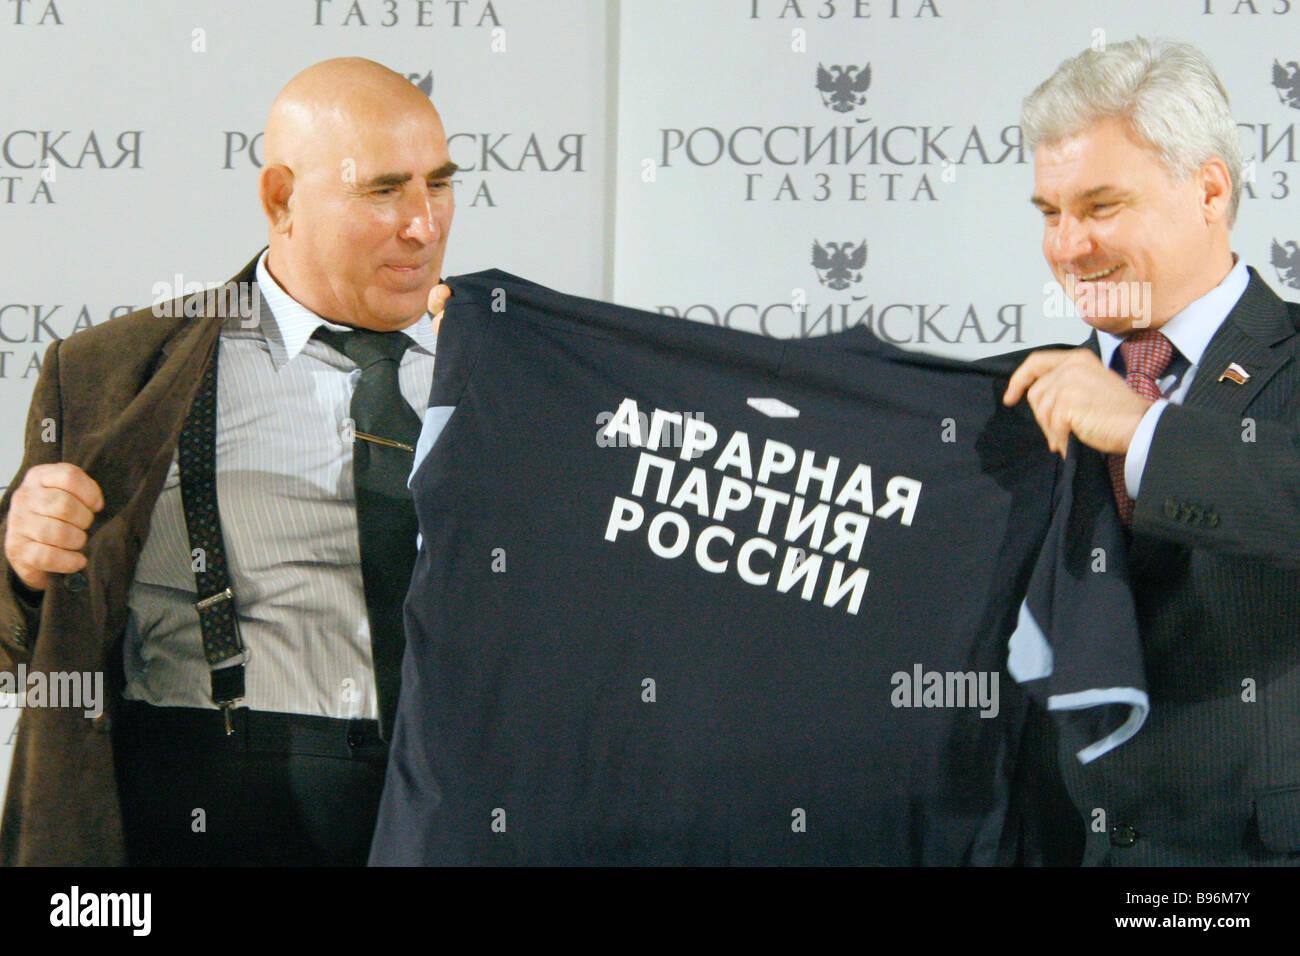 Former State Duma deputy Vasily Shandybin dies 11